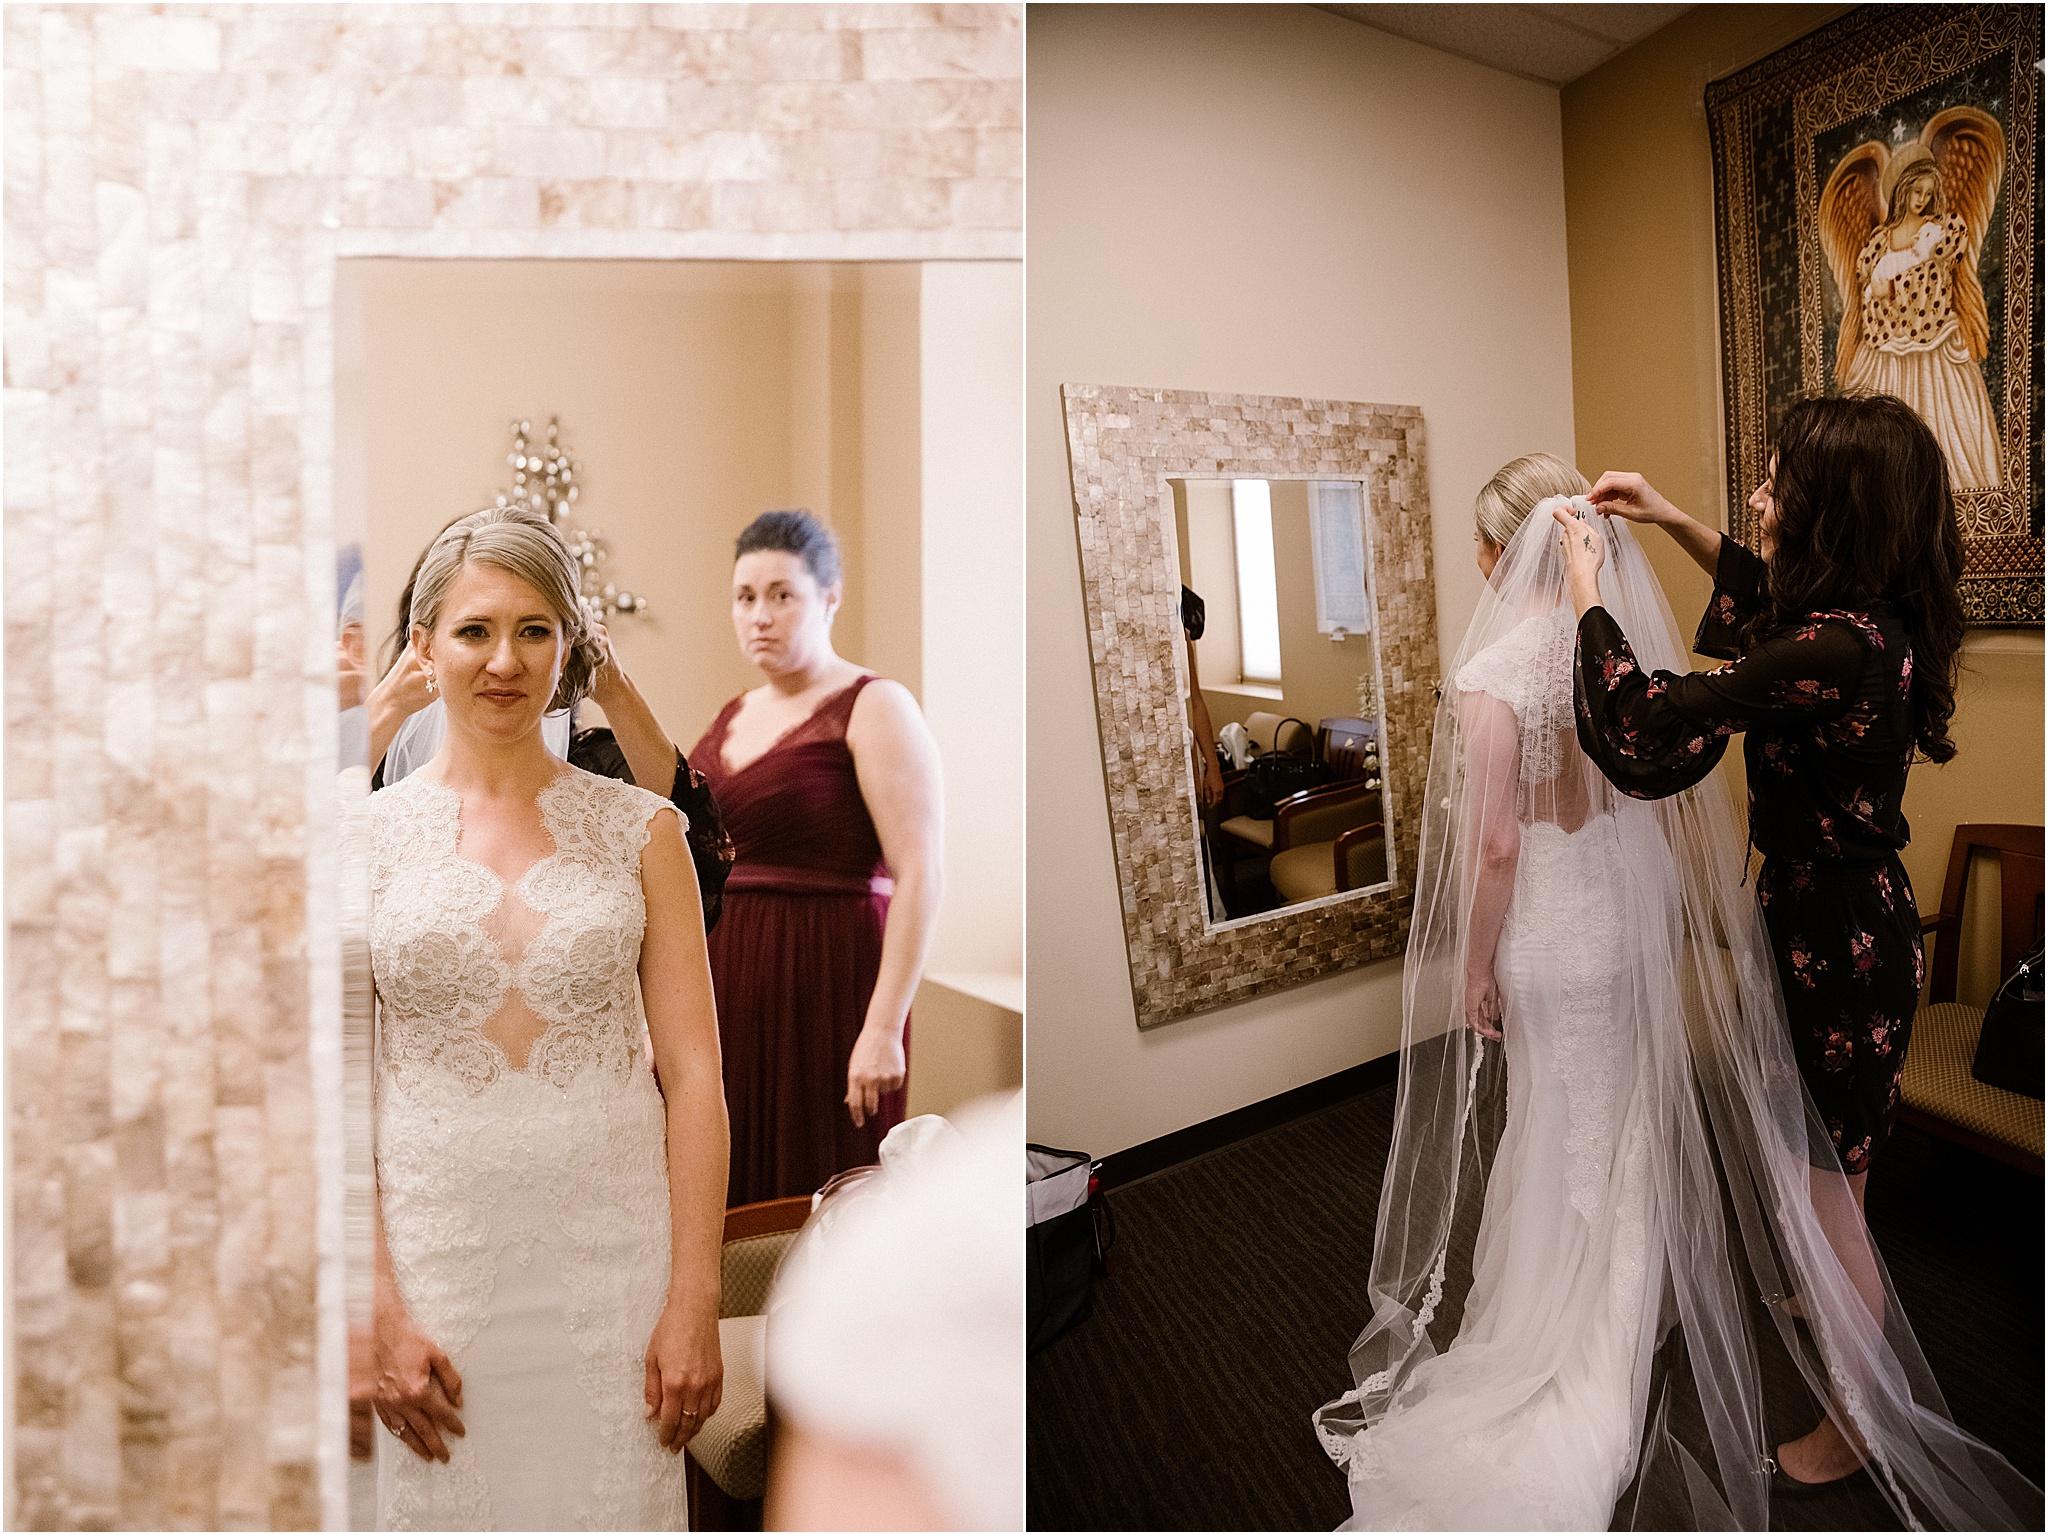 JENNA_JEROME_BLUE ROSE PHOTOGRAPHY_ABQ WEDDING_12